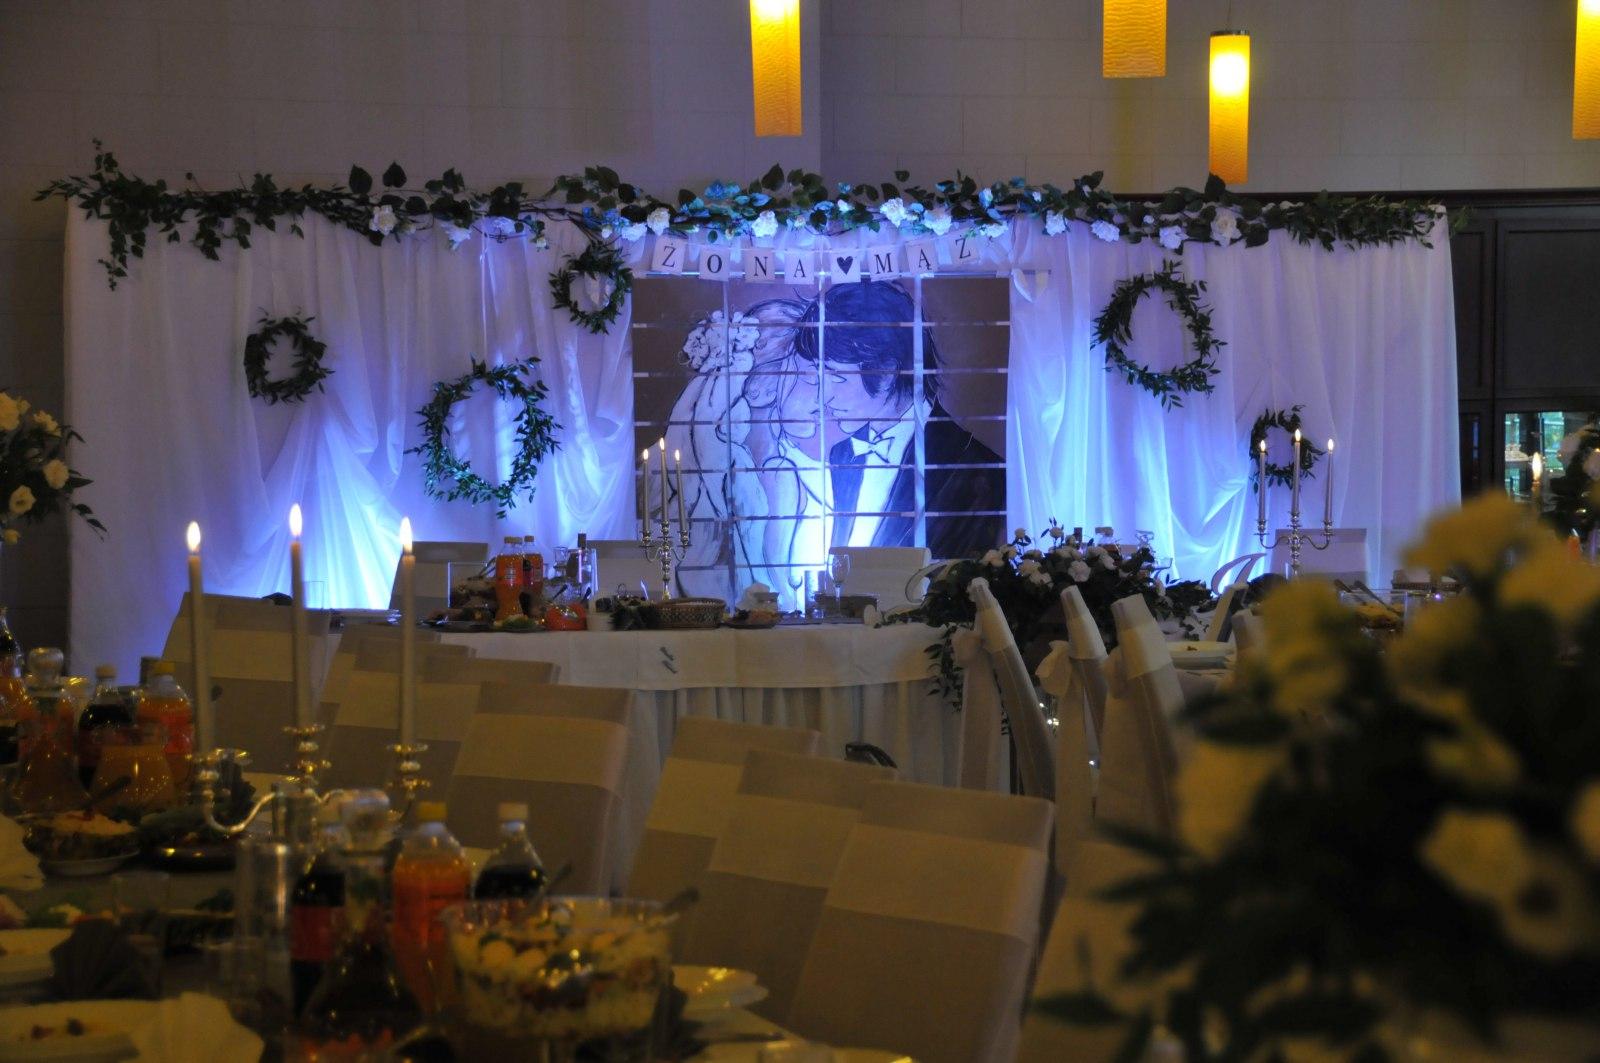 Hochzeit Am Meer Ferienhaus Wielki Błękit